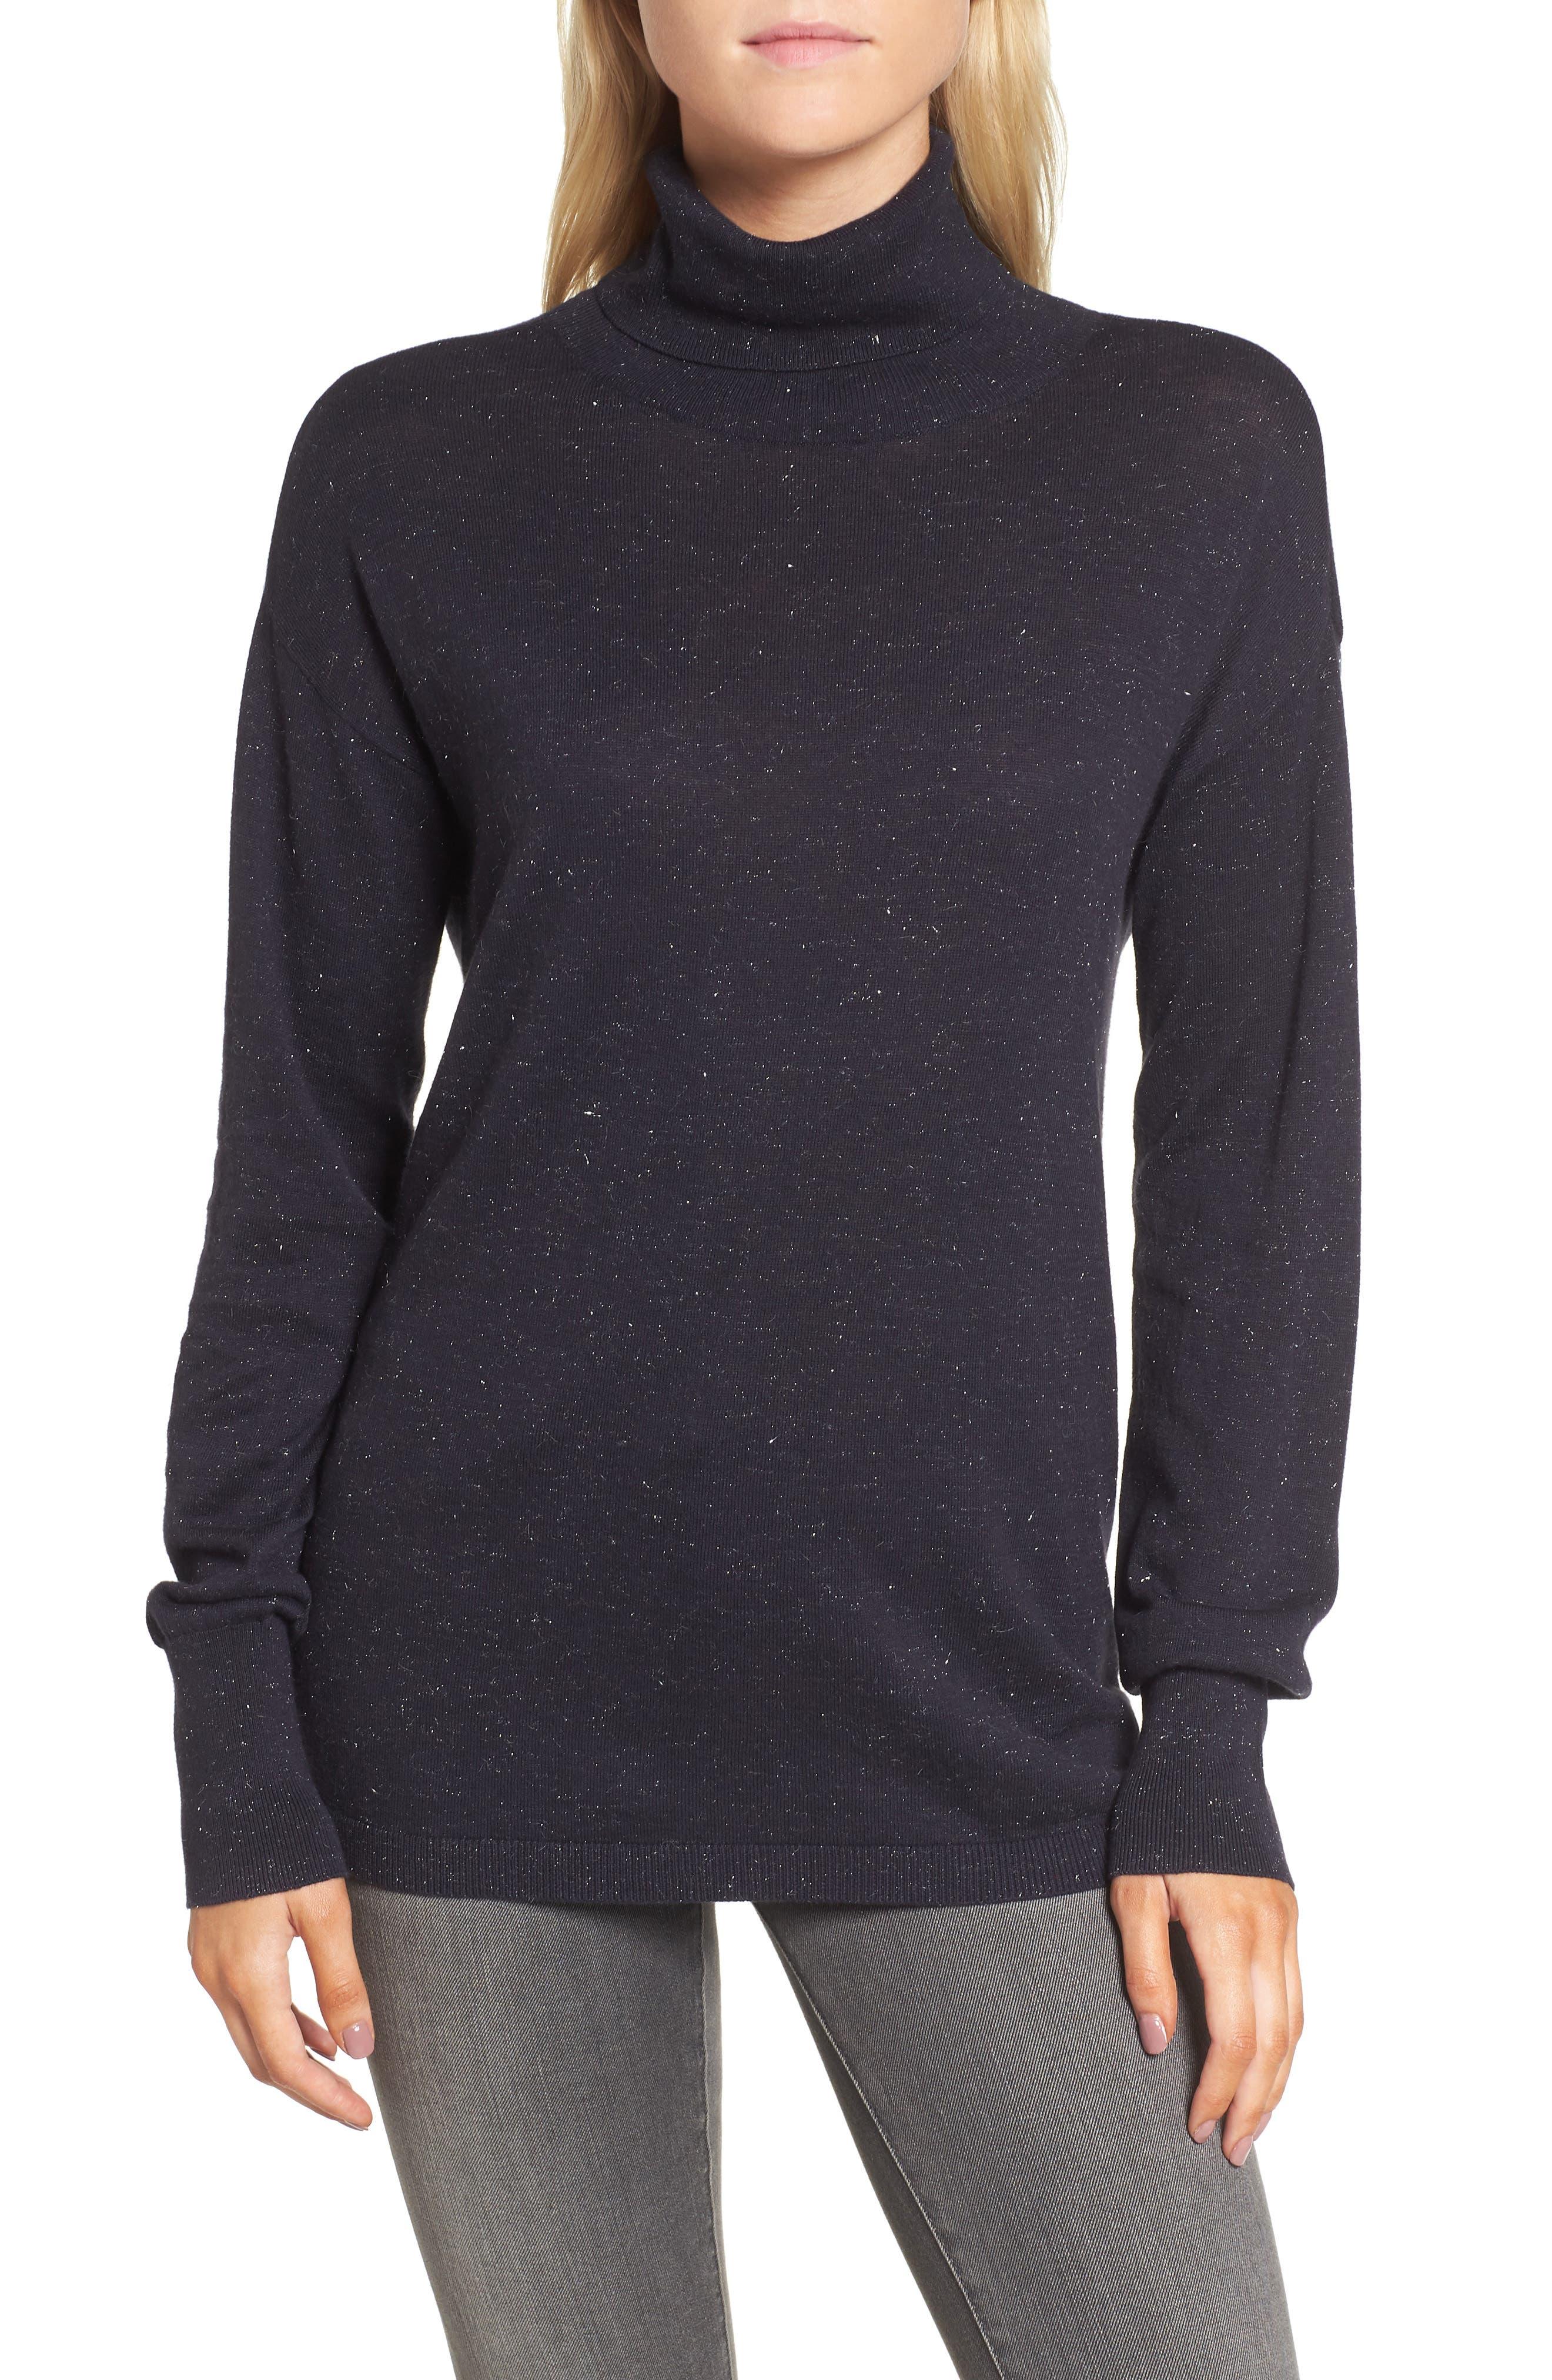 Main Image - Chelsea28 Open Back Sweater